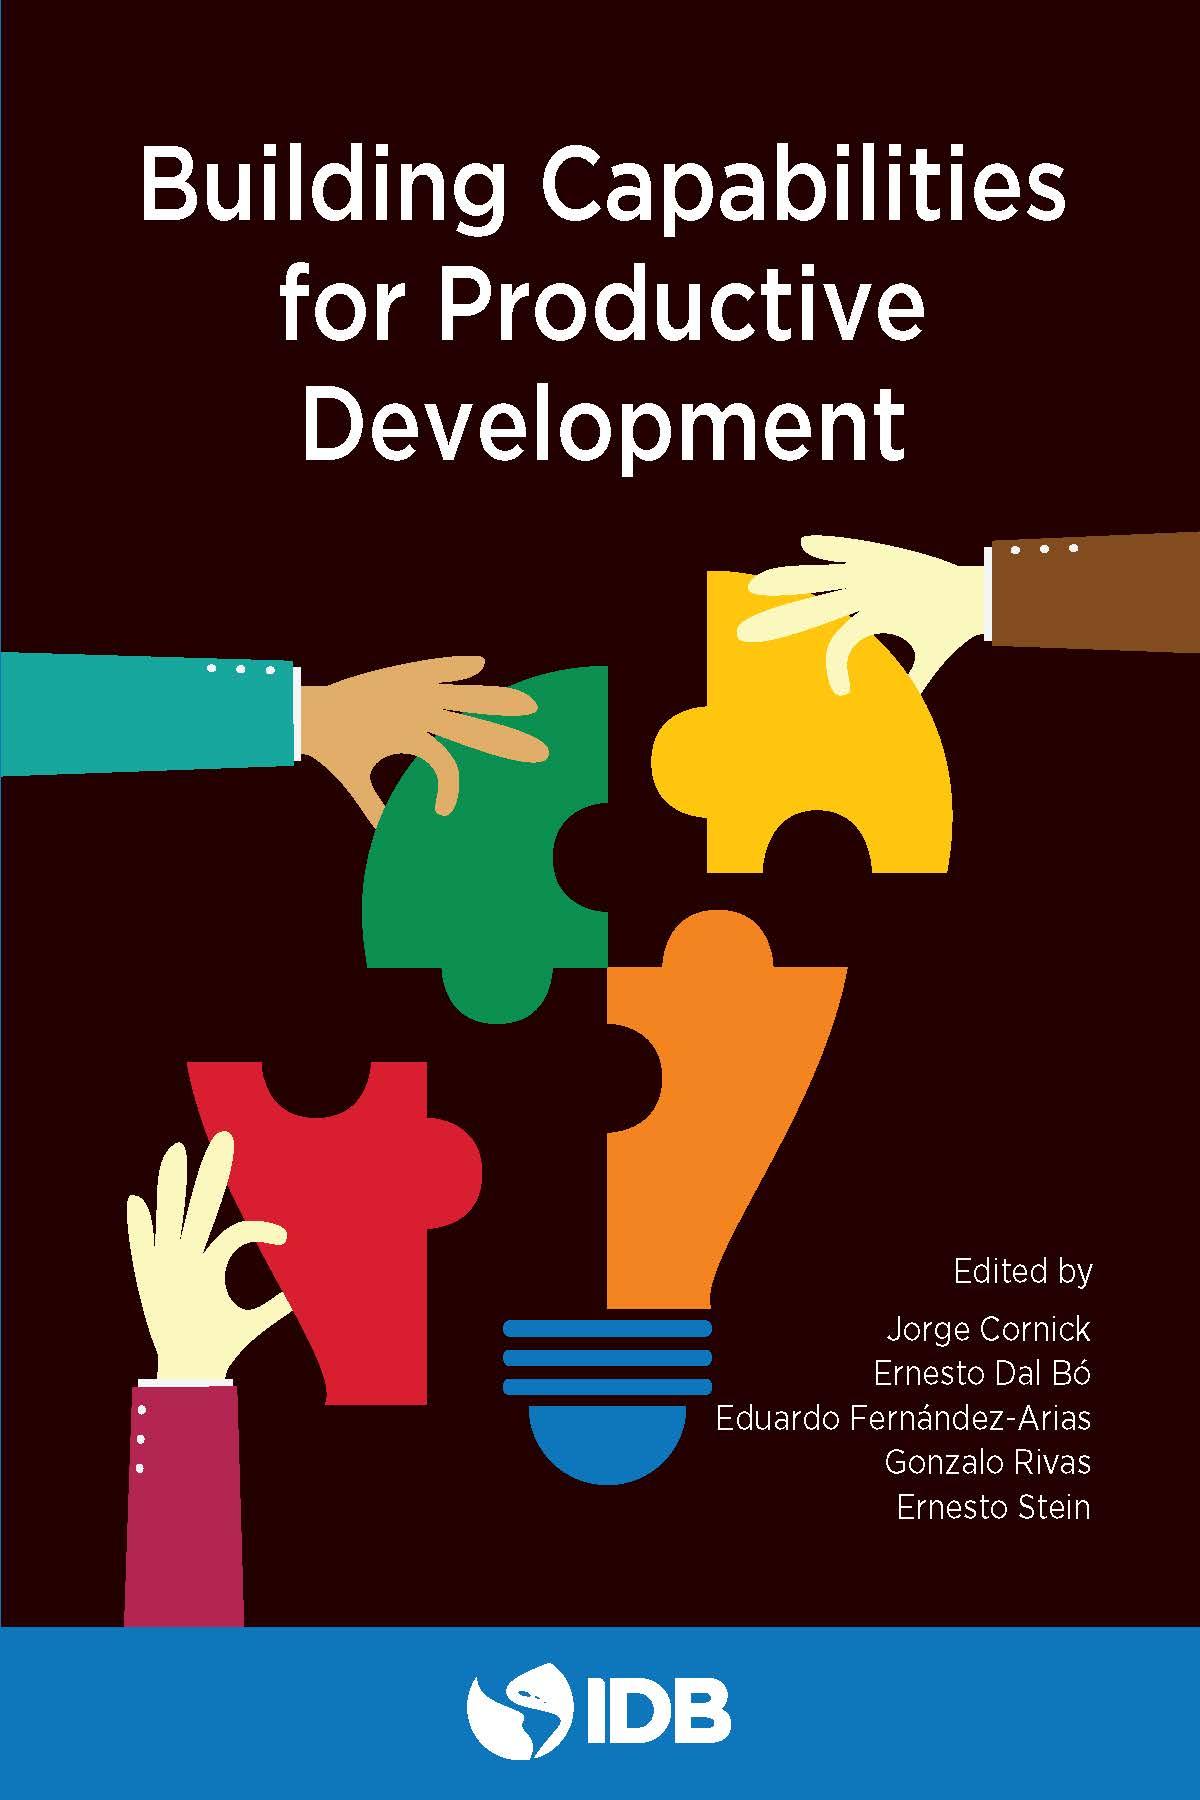 Building-Capabilities-for-Productive-Development-FINAL 1.jpg